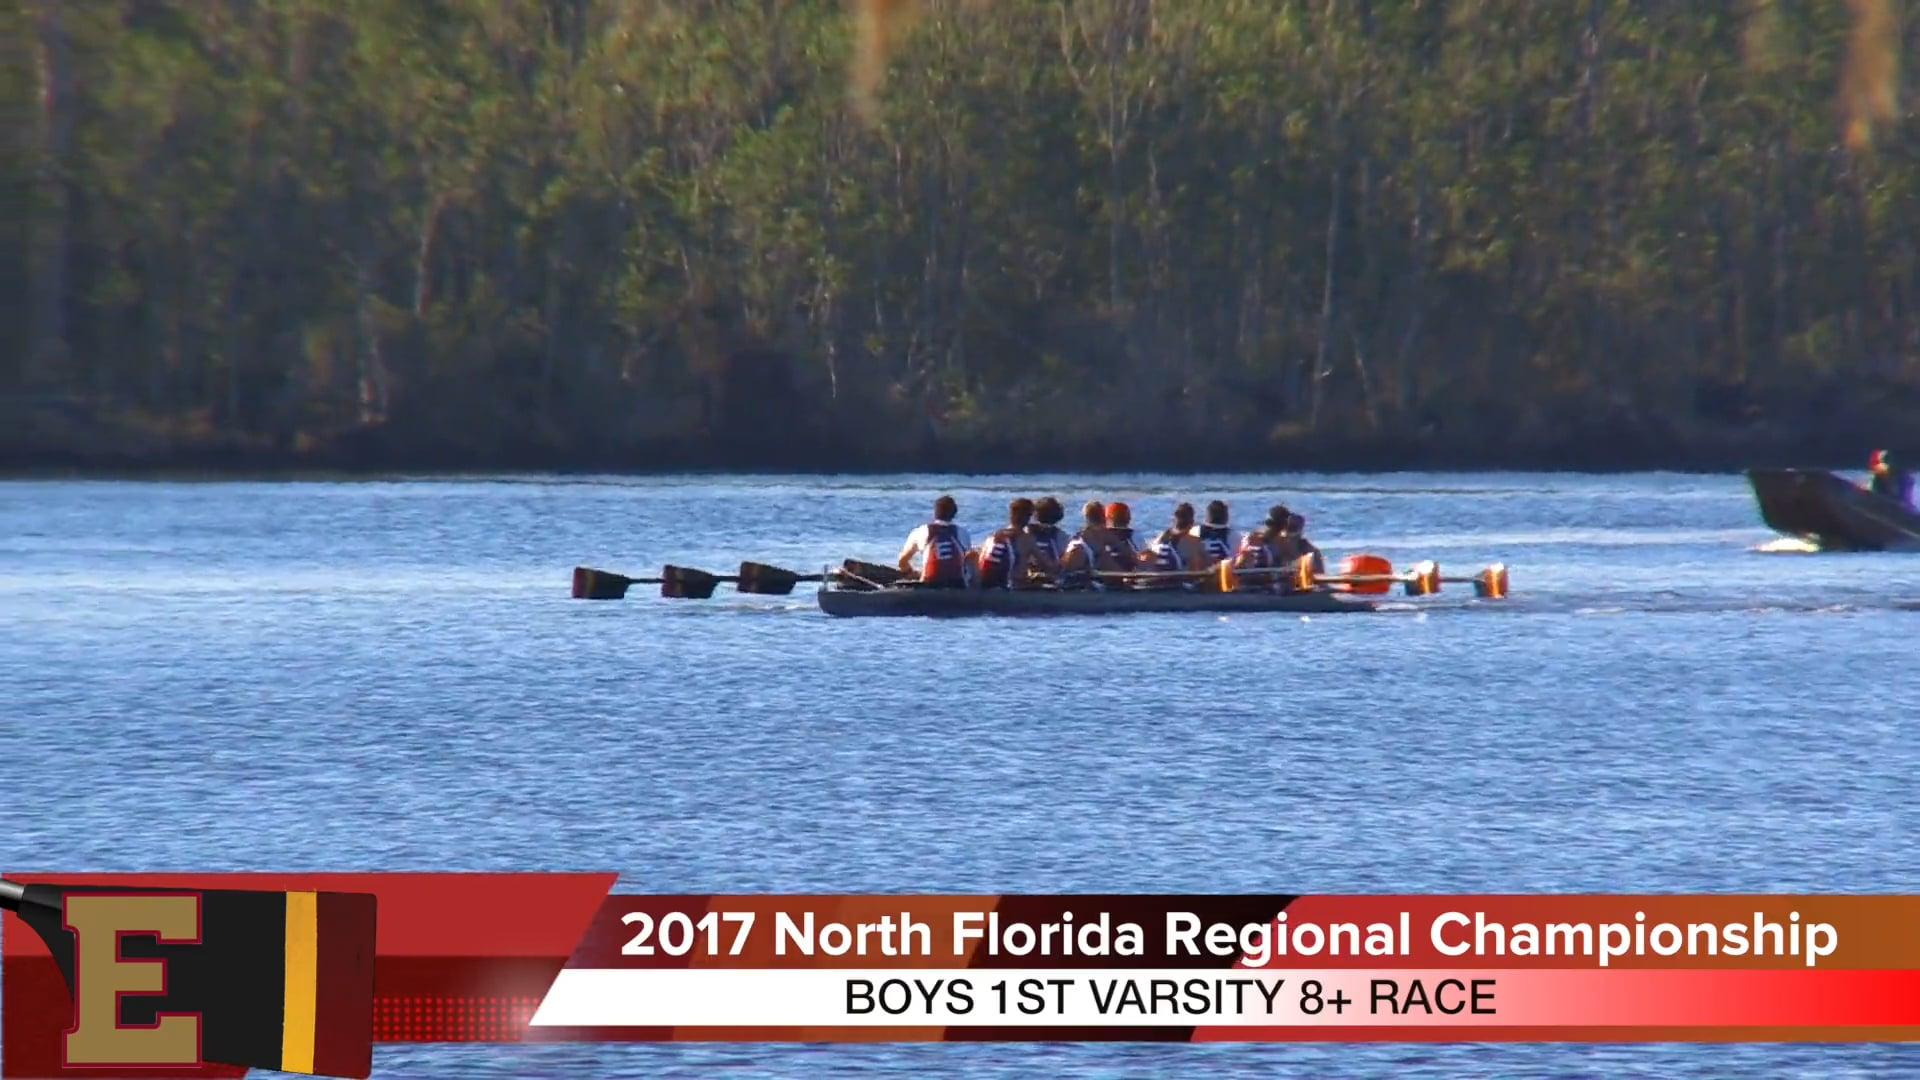 Boys 1V8+ Race 2017 FSRA North Florida Regional Championship